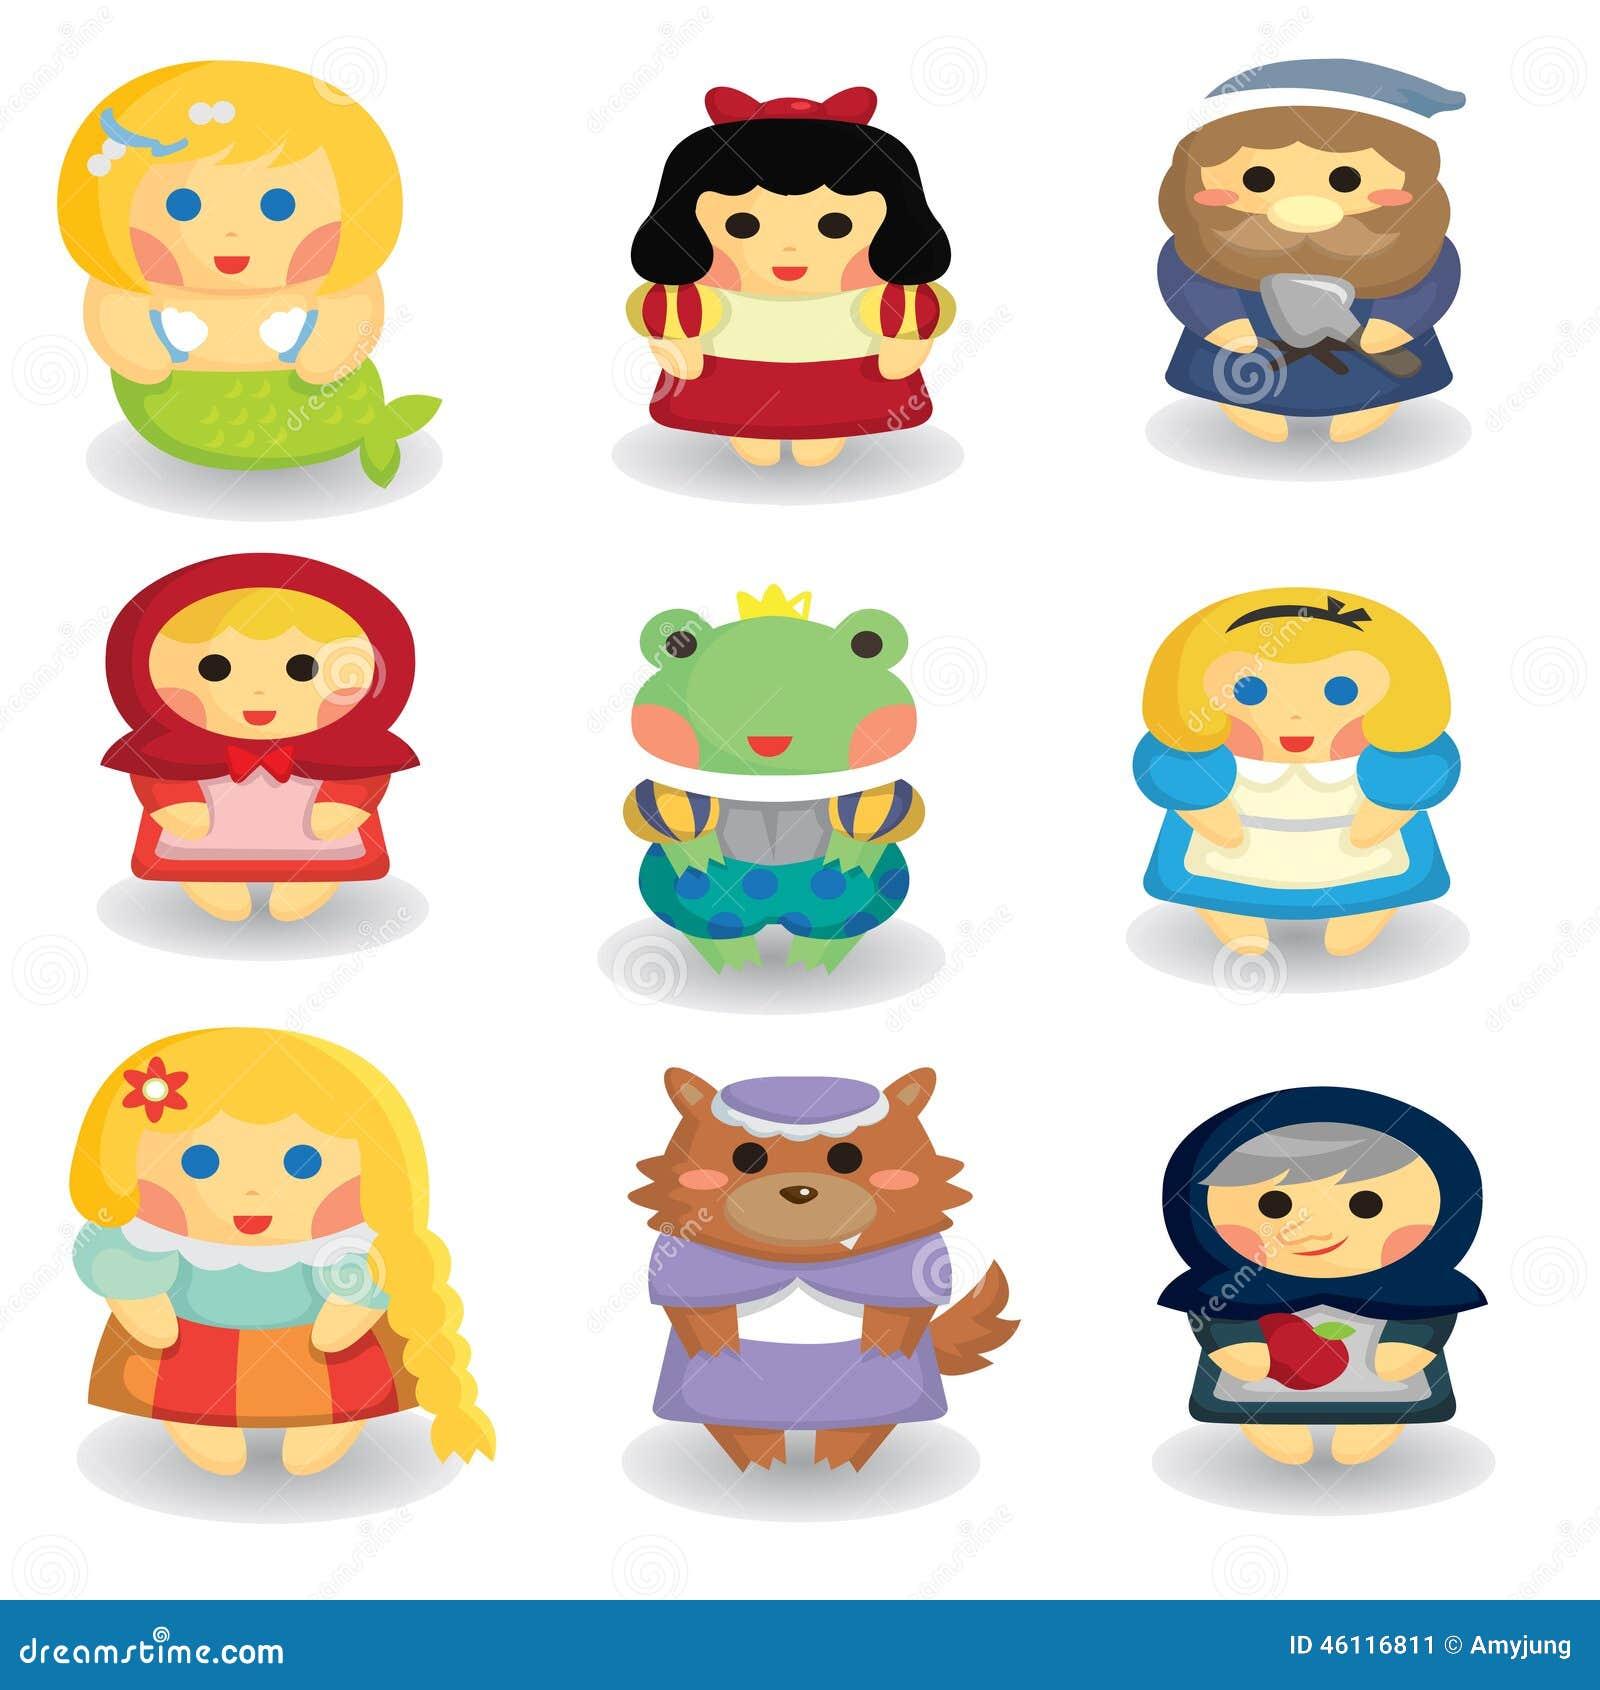 Fairytale Characters Stock Illustration - Image: 46116811